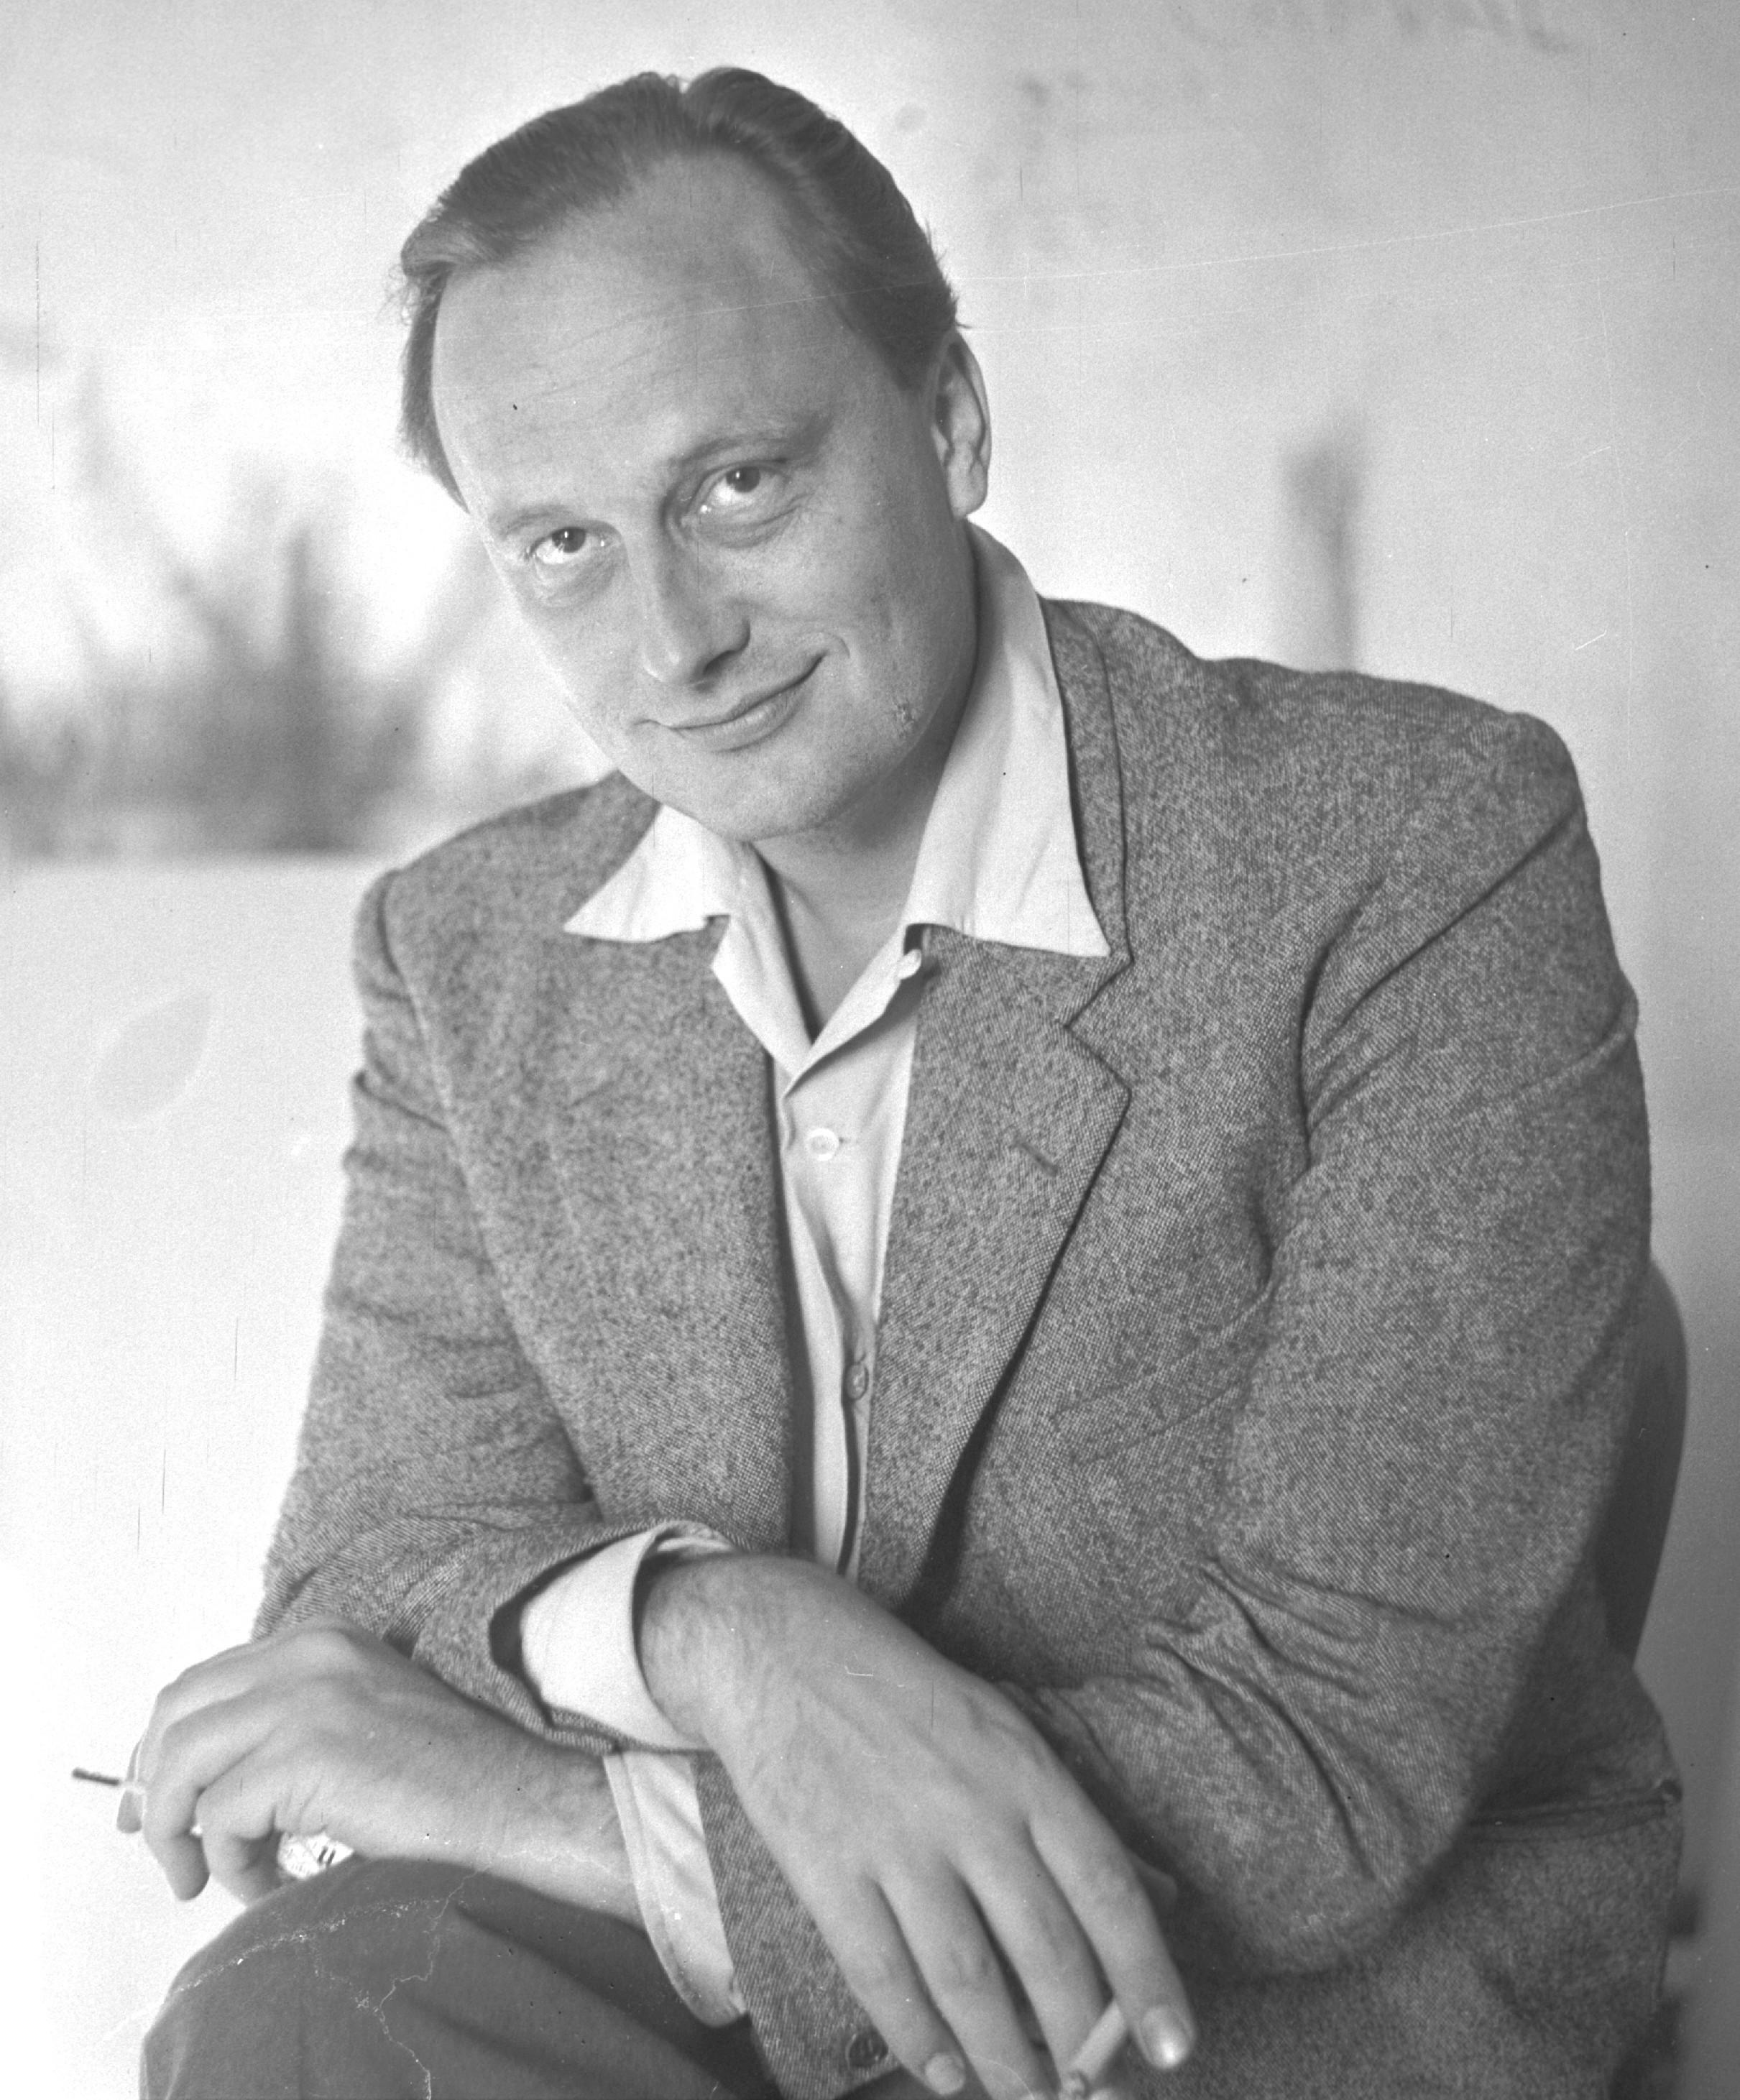 Klaus Forbregd: André Bjerke